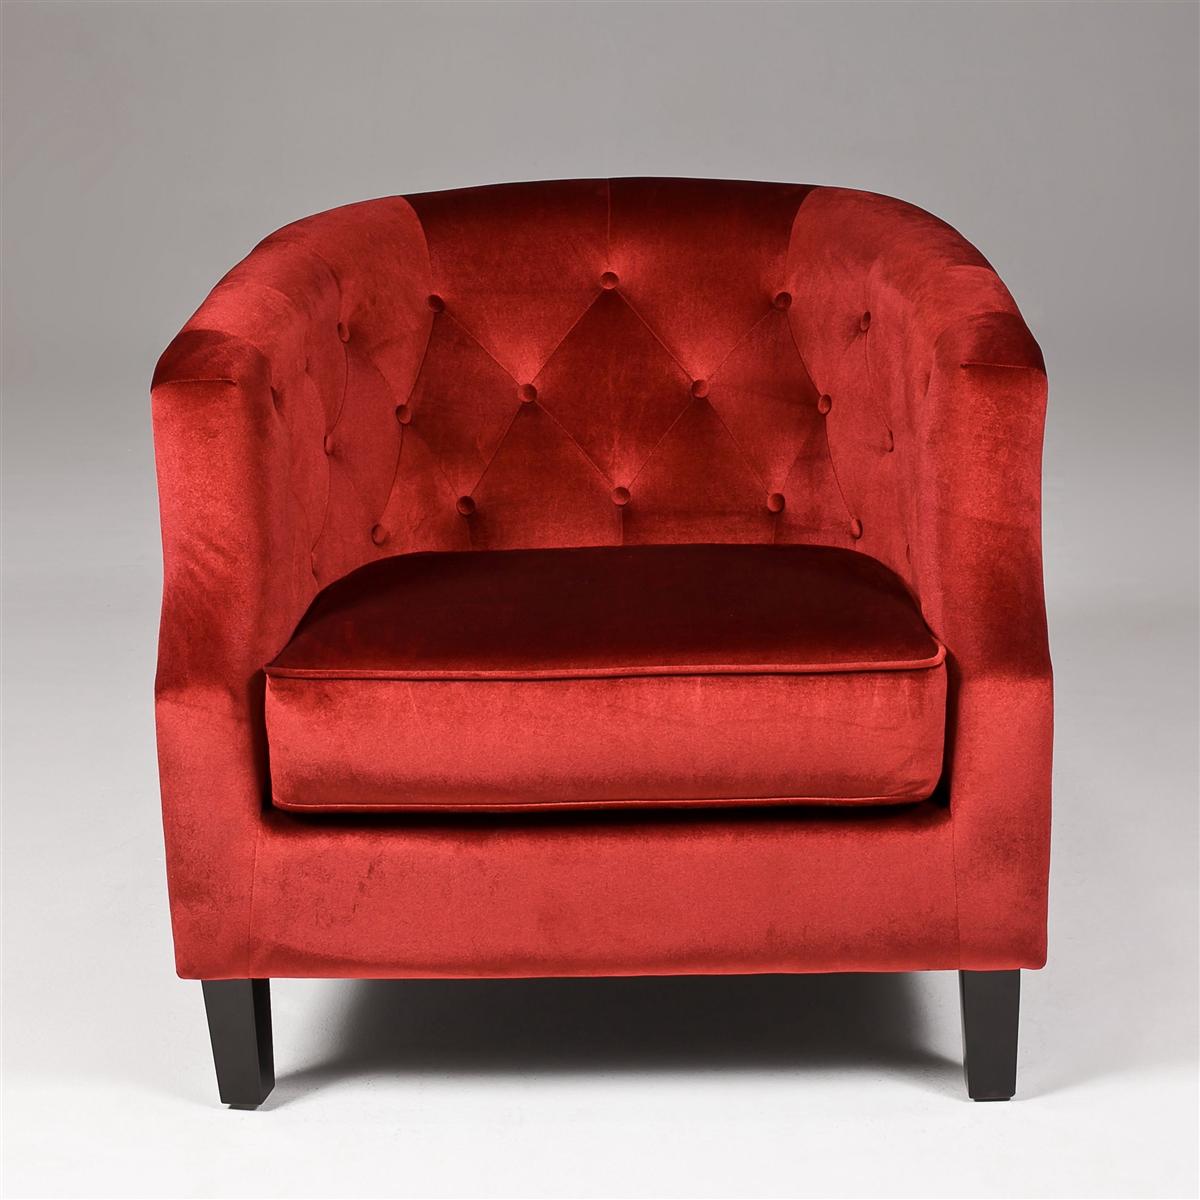 lexington sectional sofa recliner with chaise burgundy velvet   accent chair ...